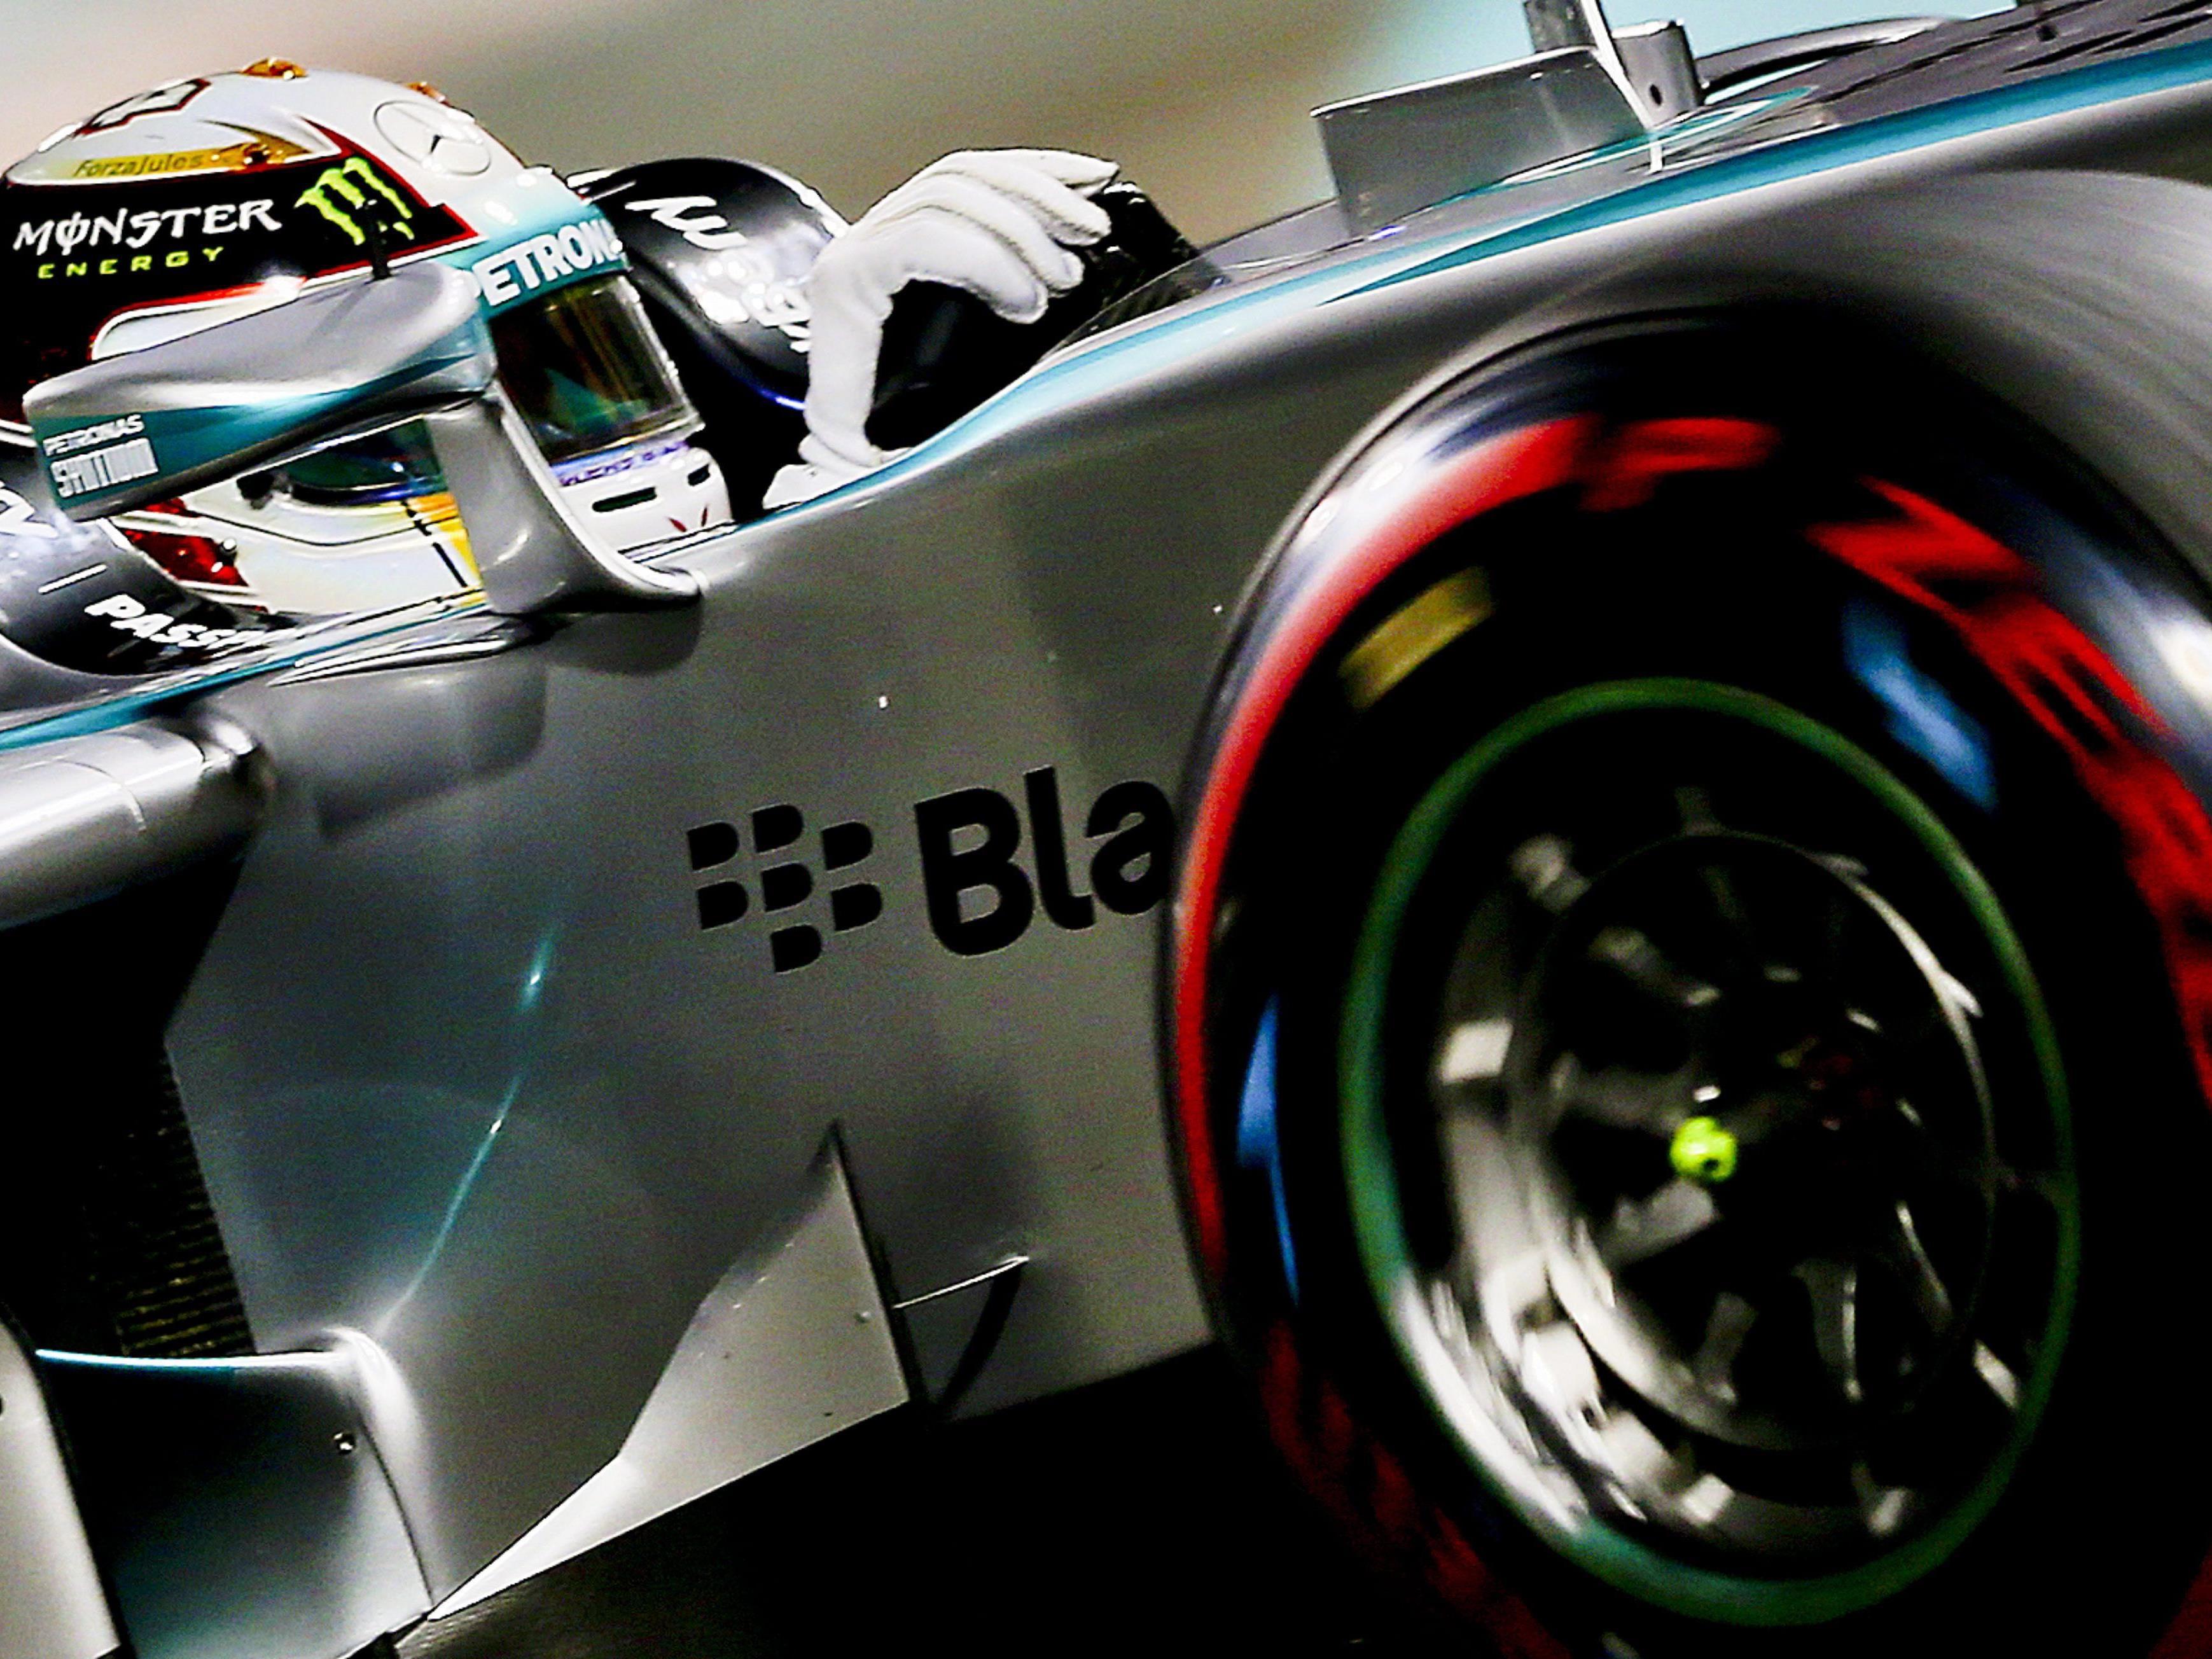 Formel 1: Rosberg im Abu-Dhabi-Abschlusstraining klar vor Hamilton.